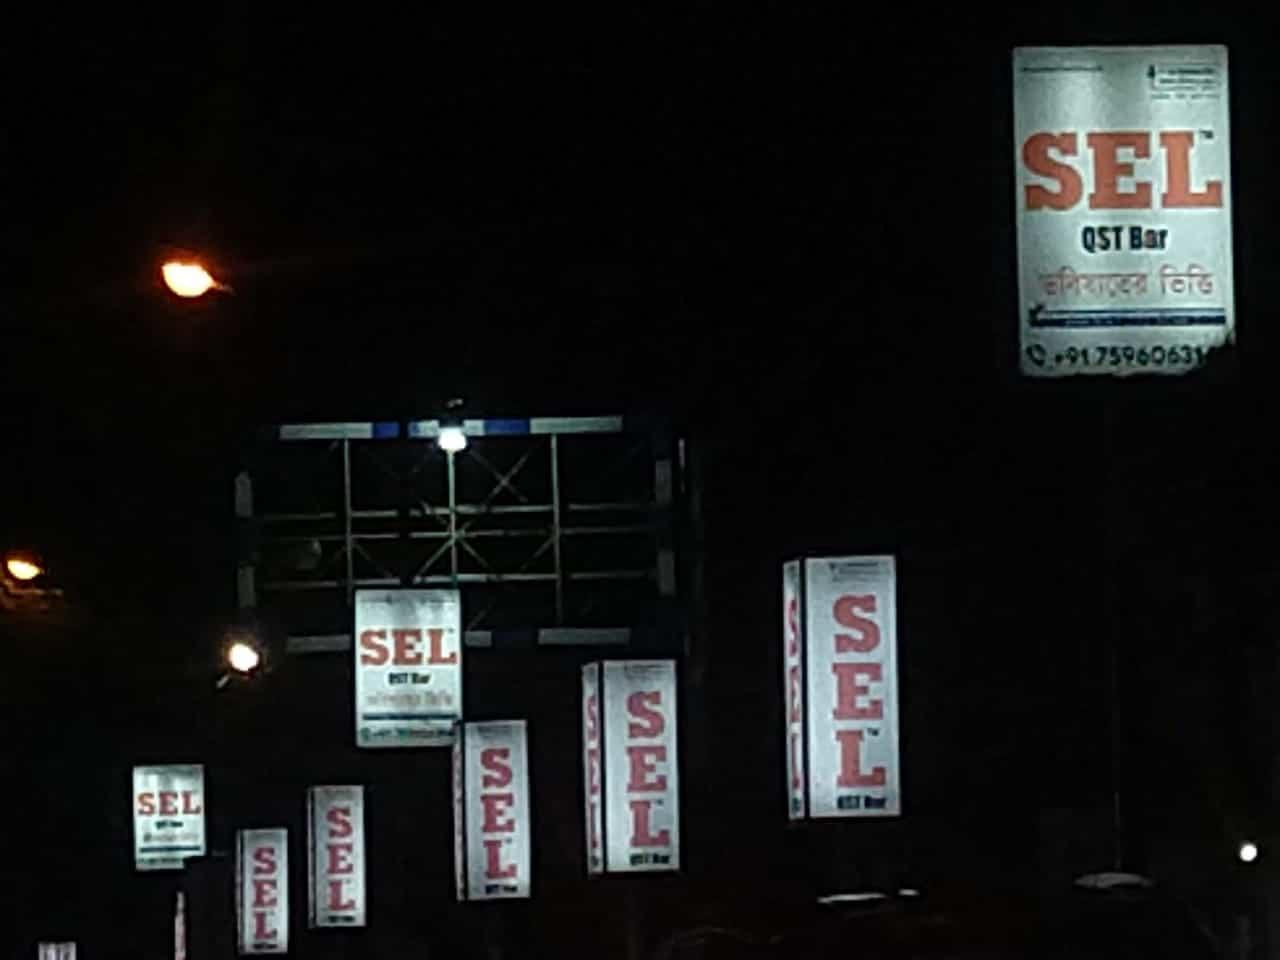 Shyam SEL QST Bar - Best TMT Bars For Construction in India